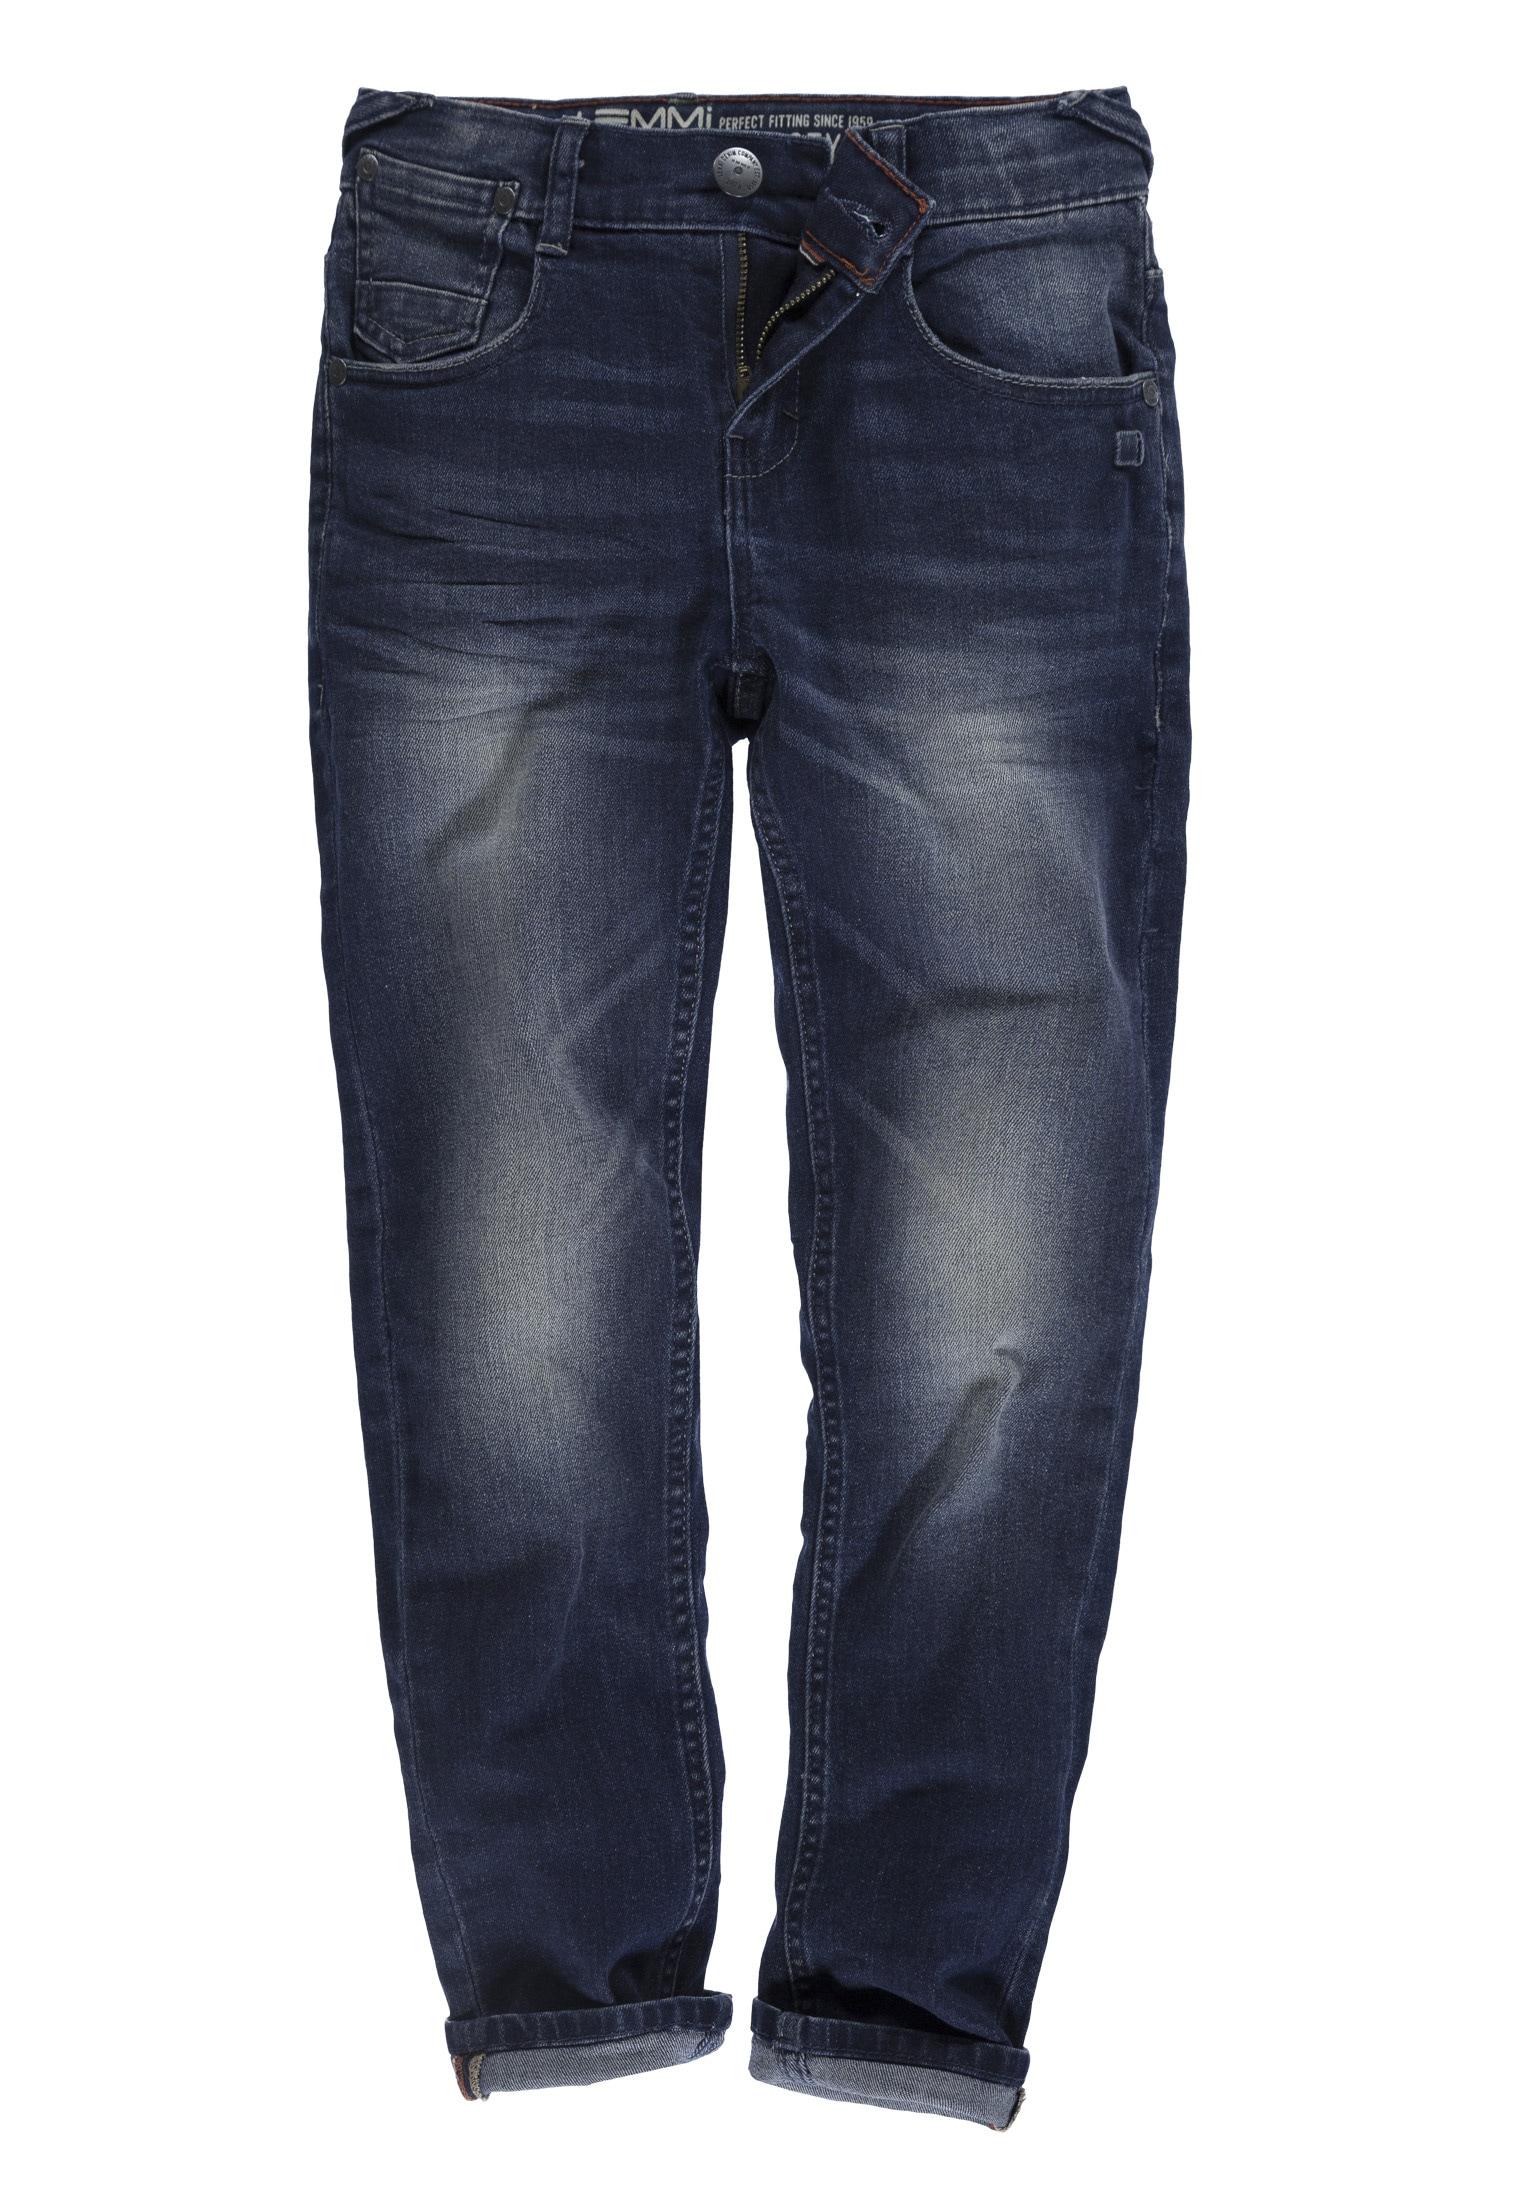 Image of Lemmi Hose Jeans Boys tight fit BIG »Ken«